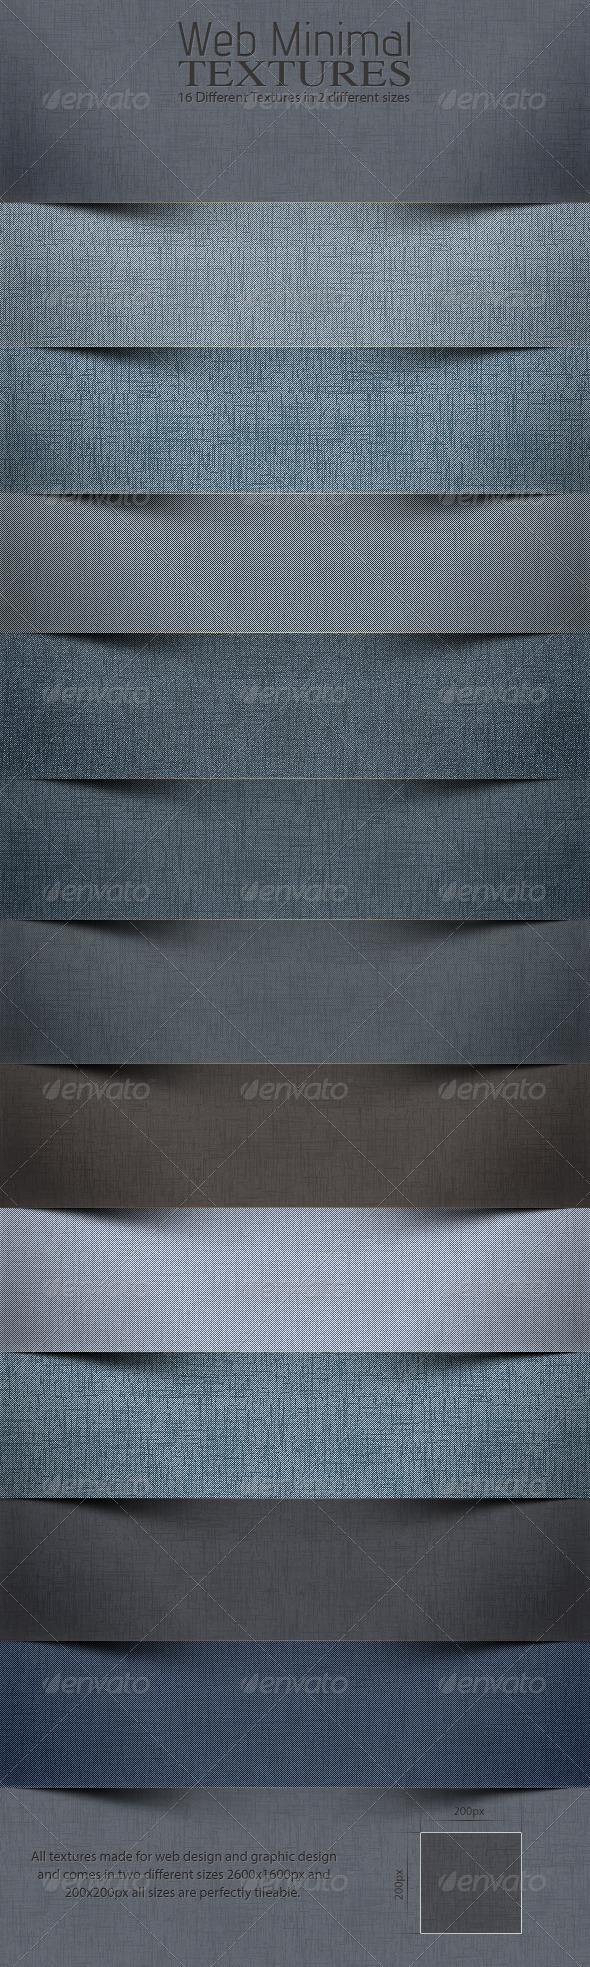 GraphicRiver Web Minimal Textures 4.0 3469056